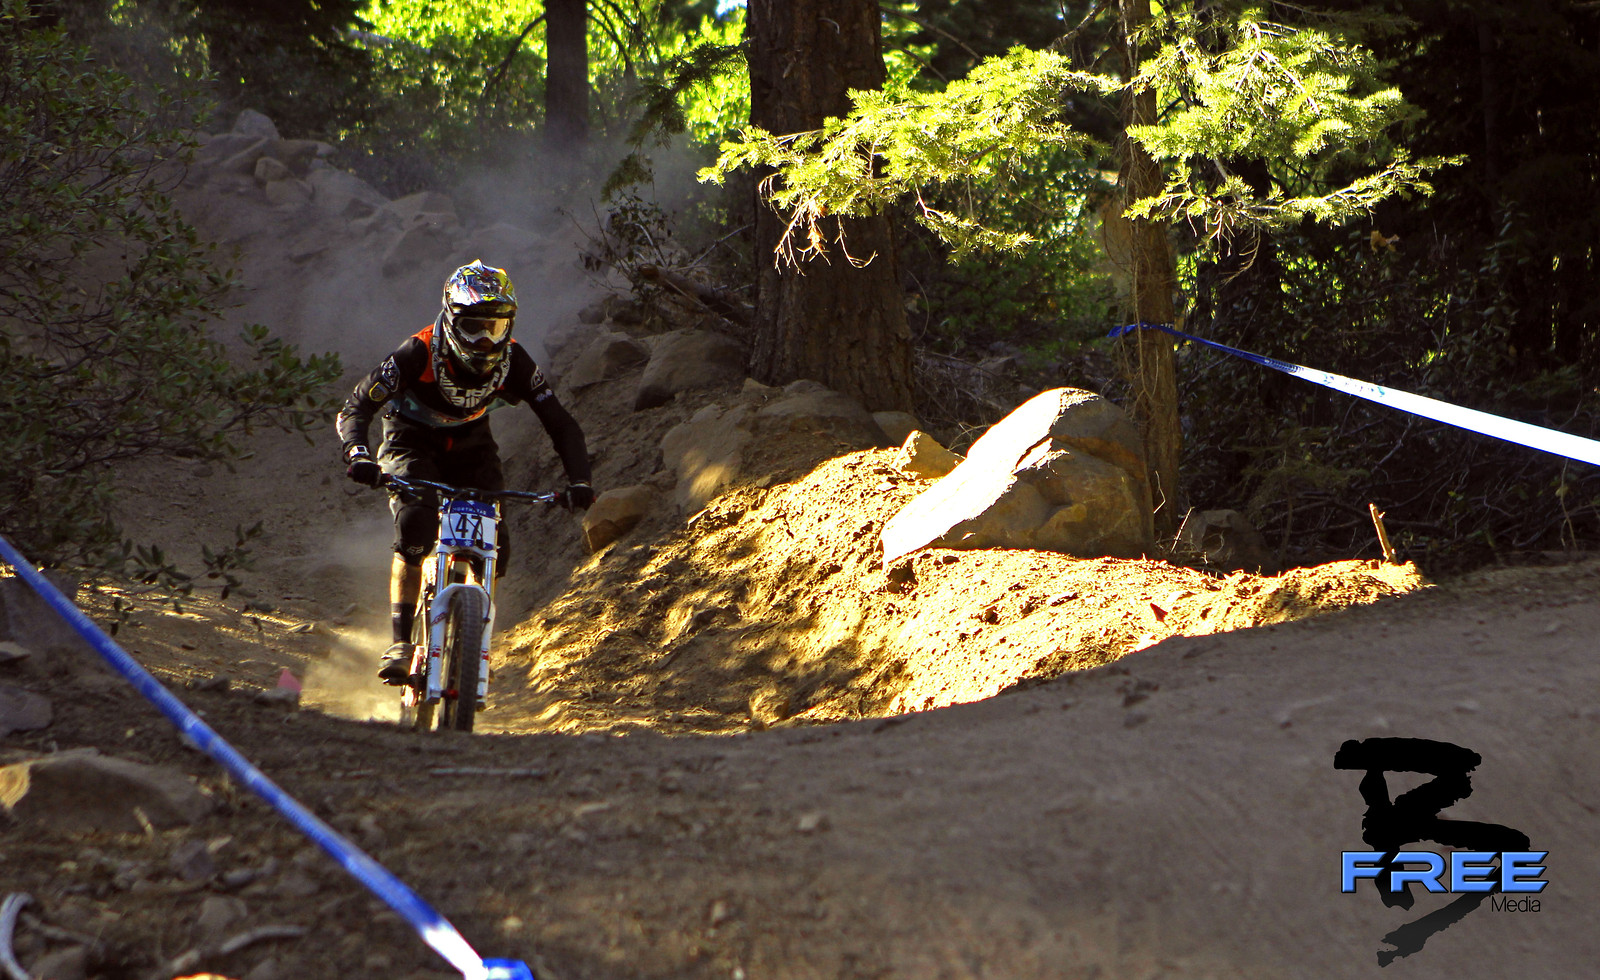 done3 - GnarHuck - Mountain Biking Pictures - Vital MTB